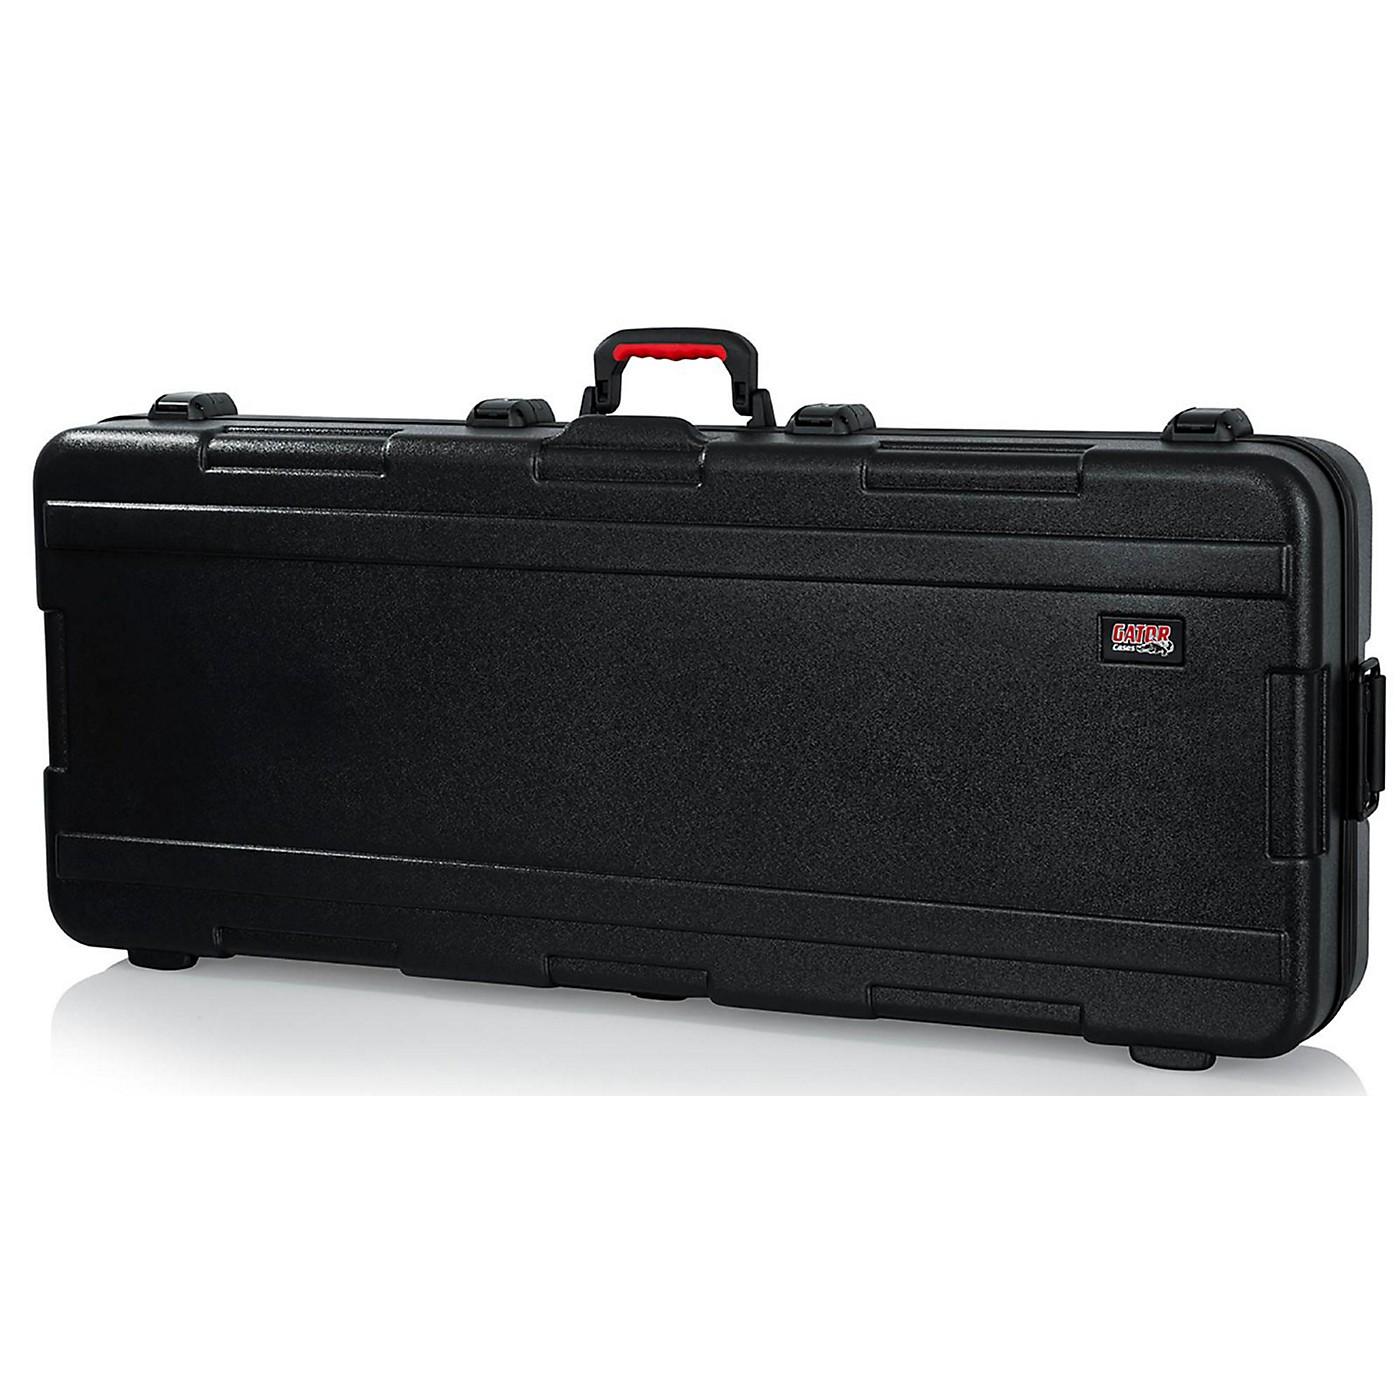 Gator TSA ATA Deep 76-note Keyboard Case with Wheels thumbnail